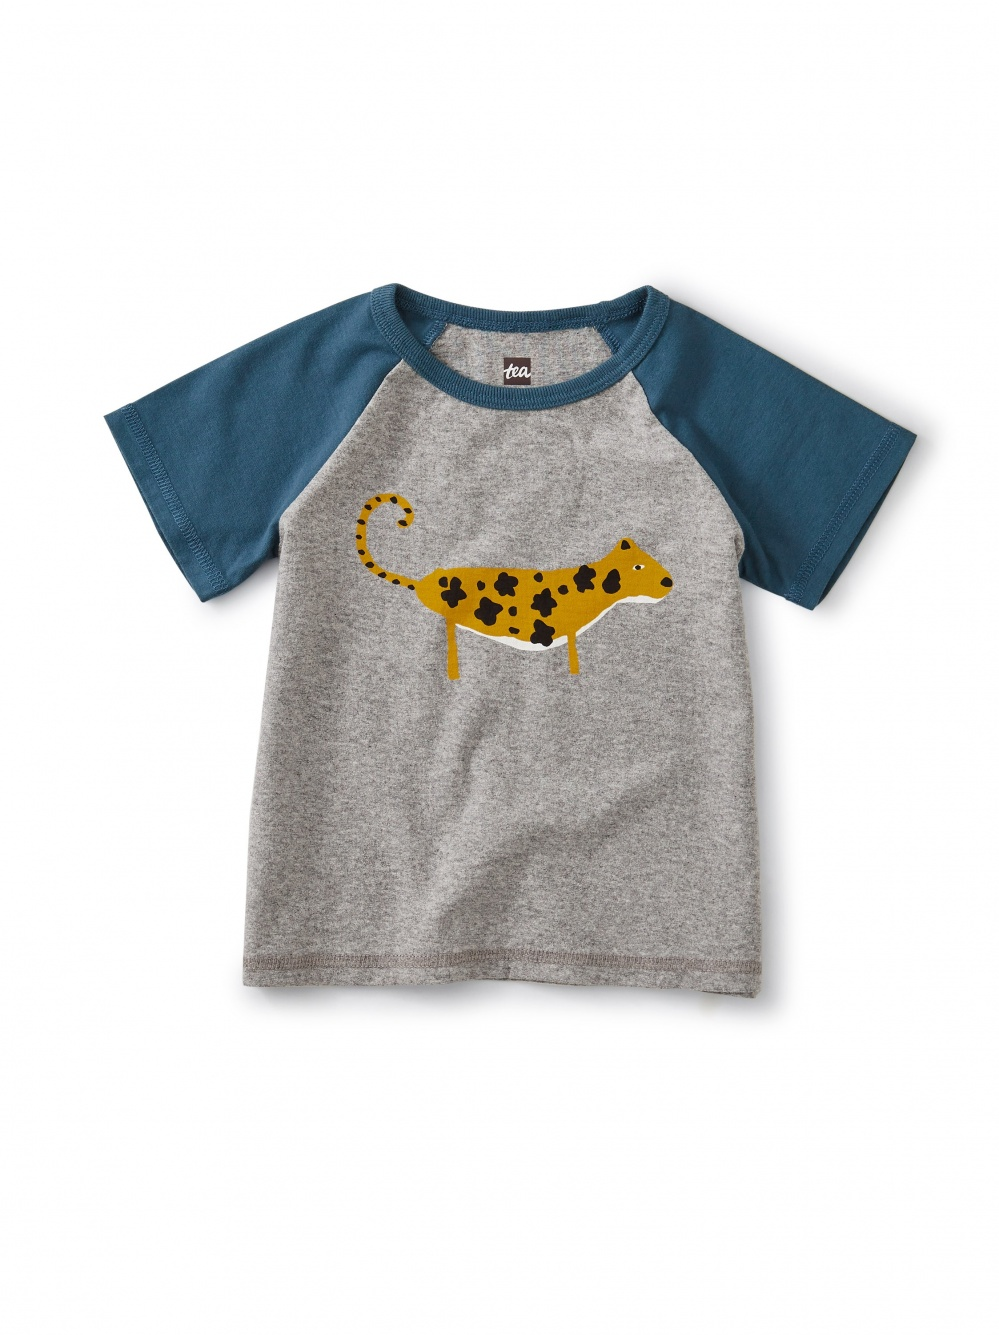 Leopard Cub Club Raglan Tee